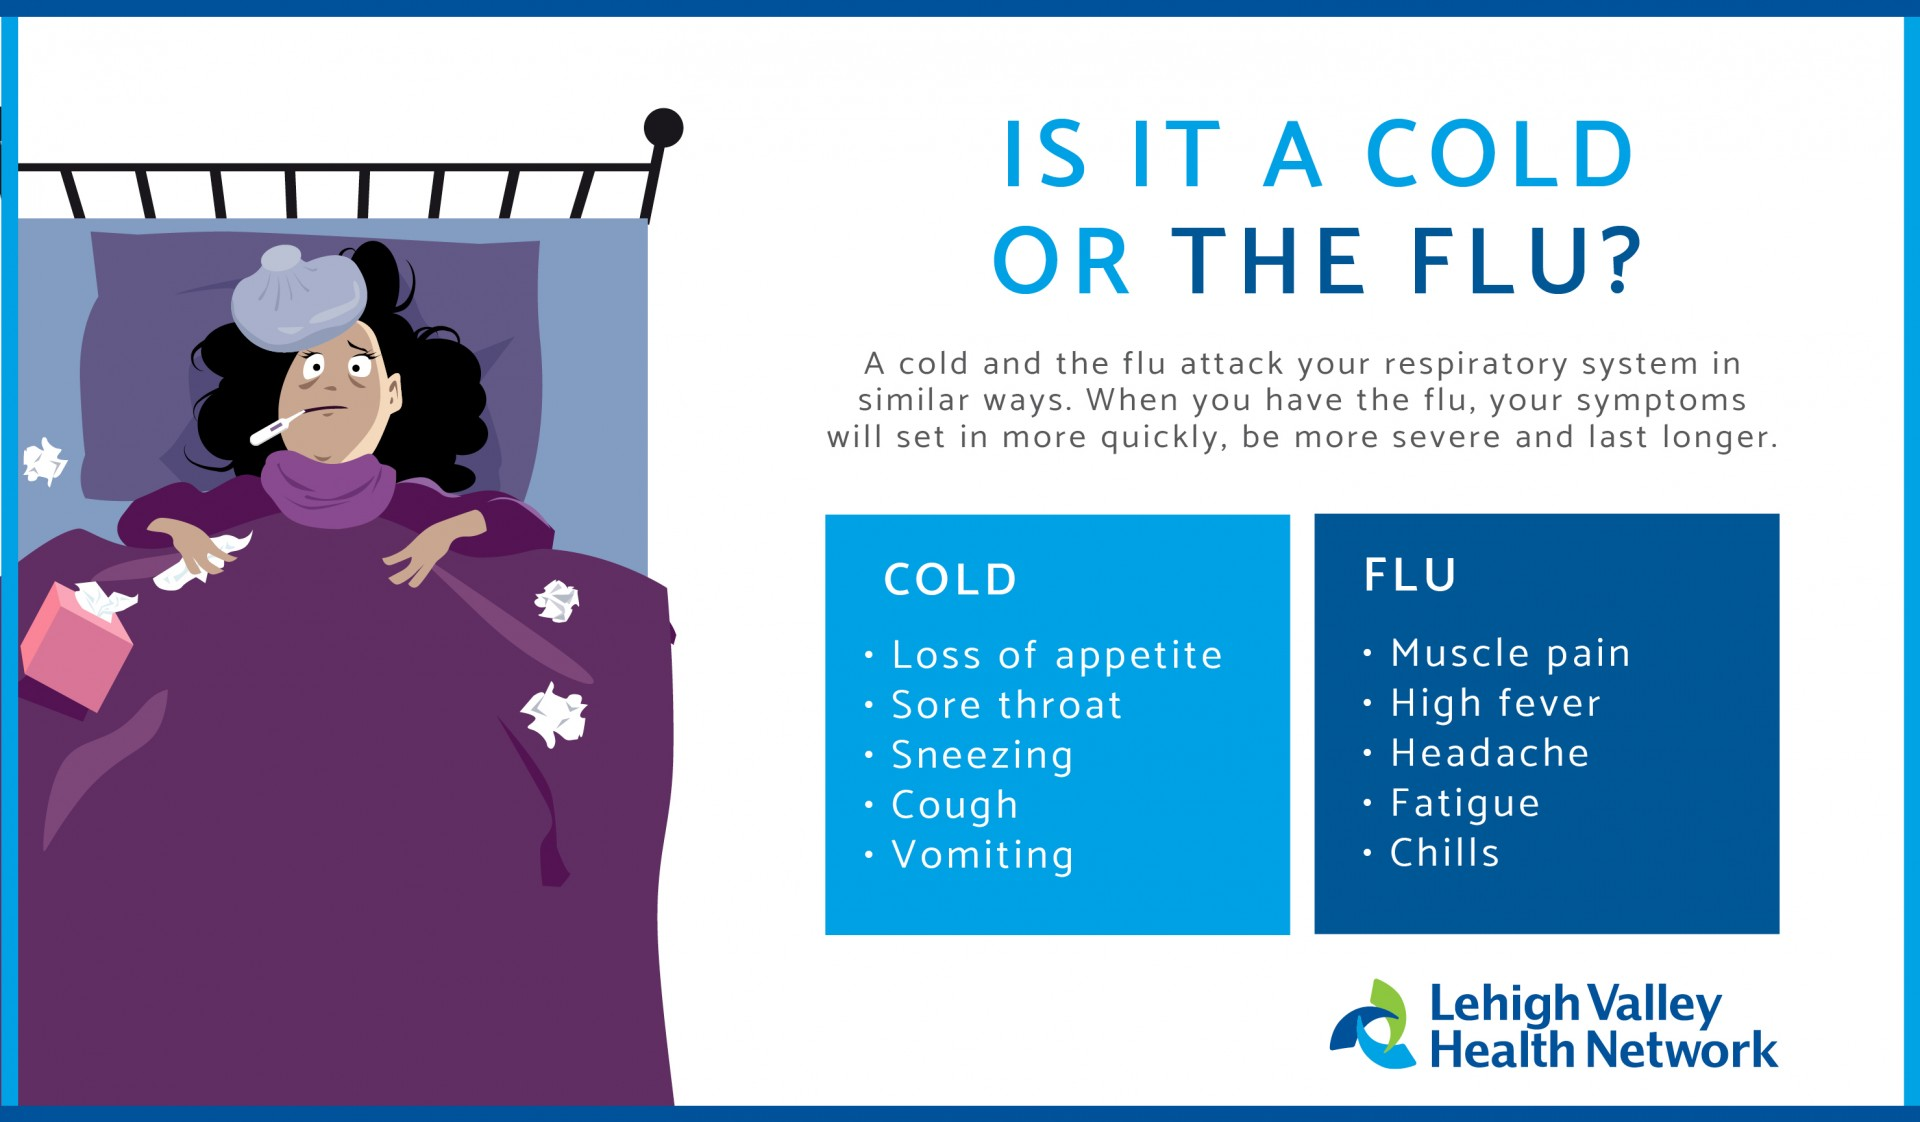 Know Your Symptoms: Cold vs Flu